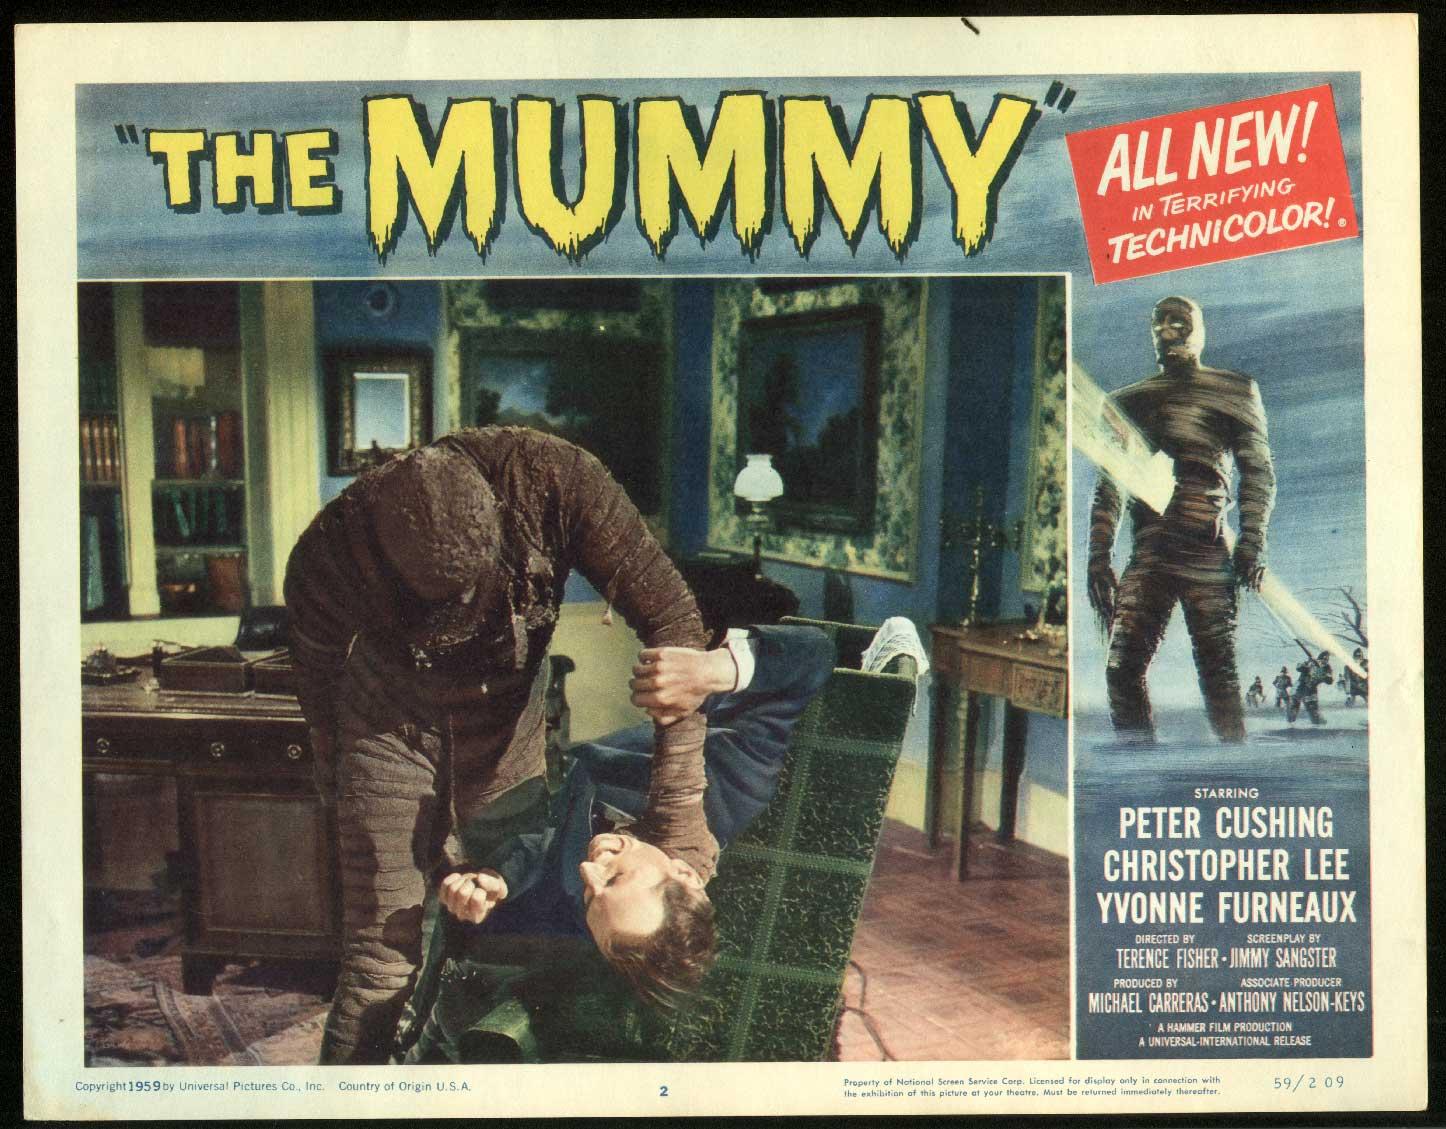 the-mummy-1959-dir-fisher-peter-cushing-christopher-lee1.jpg